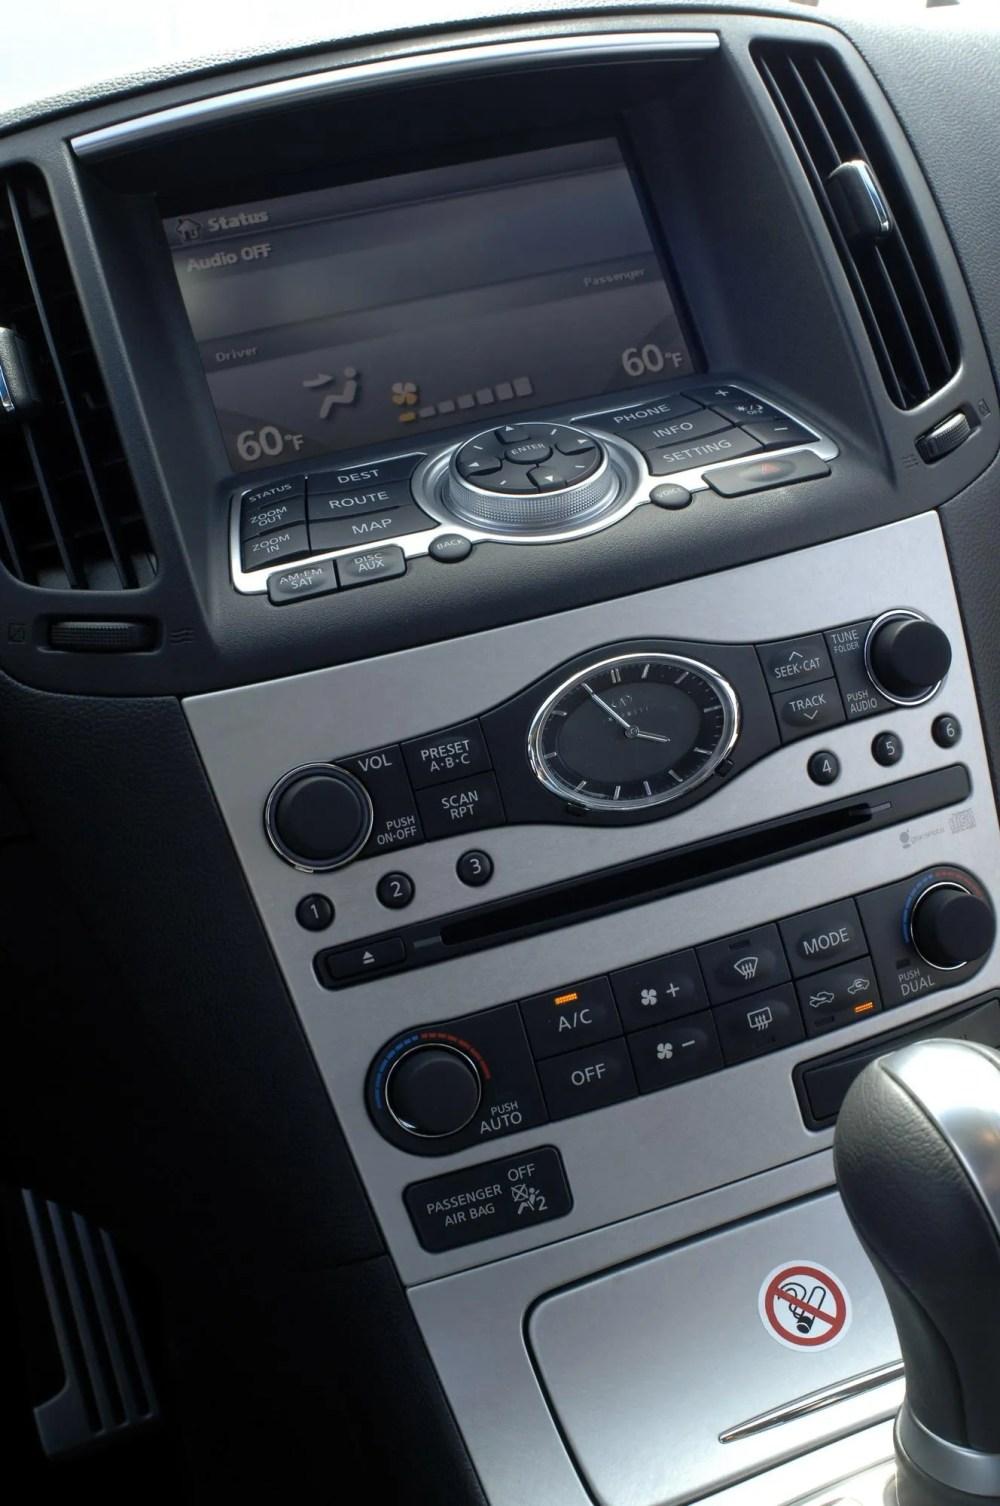 medium resolution of 2008 infiniti g37 top speed infiniti g37 coupe interior infiniti g37 audio system diagram